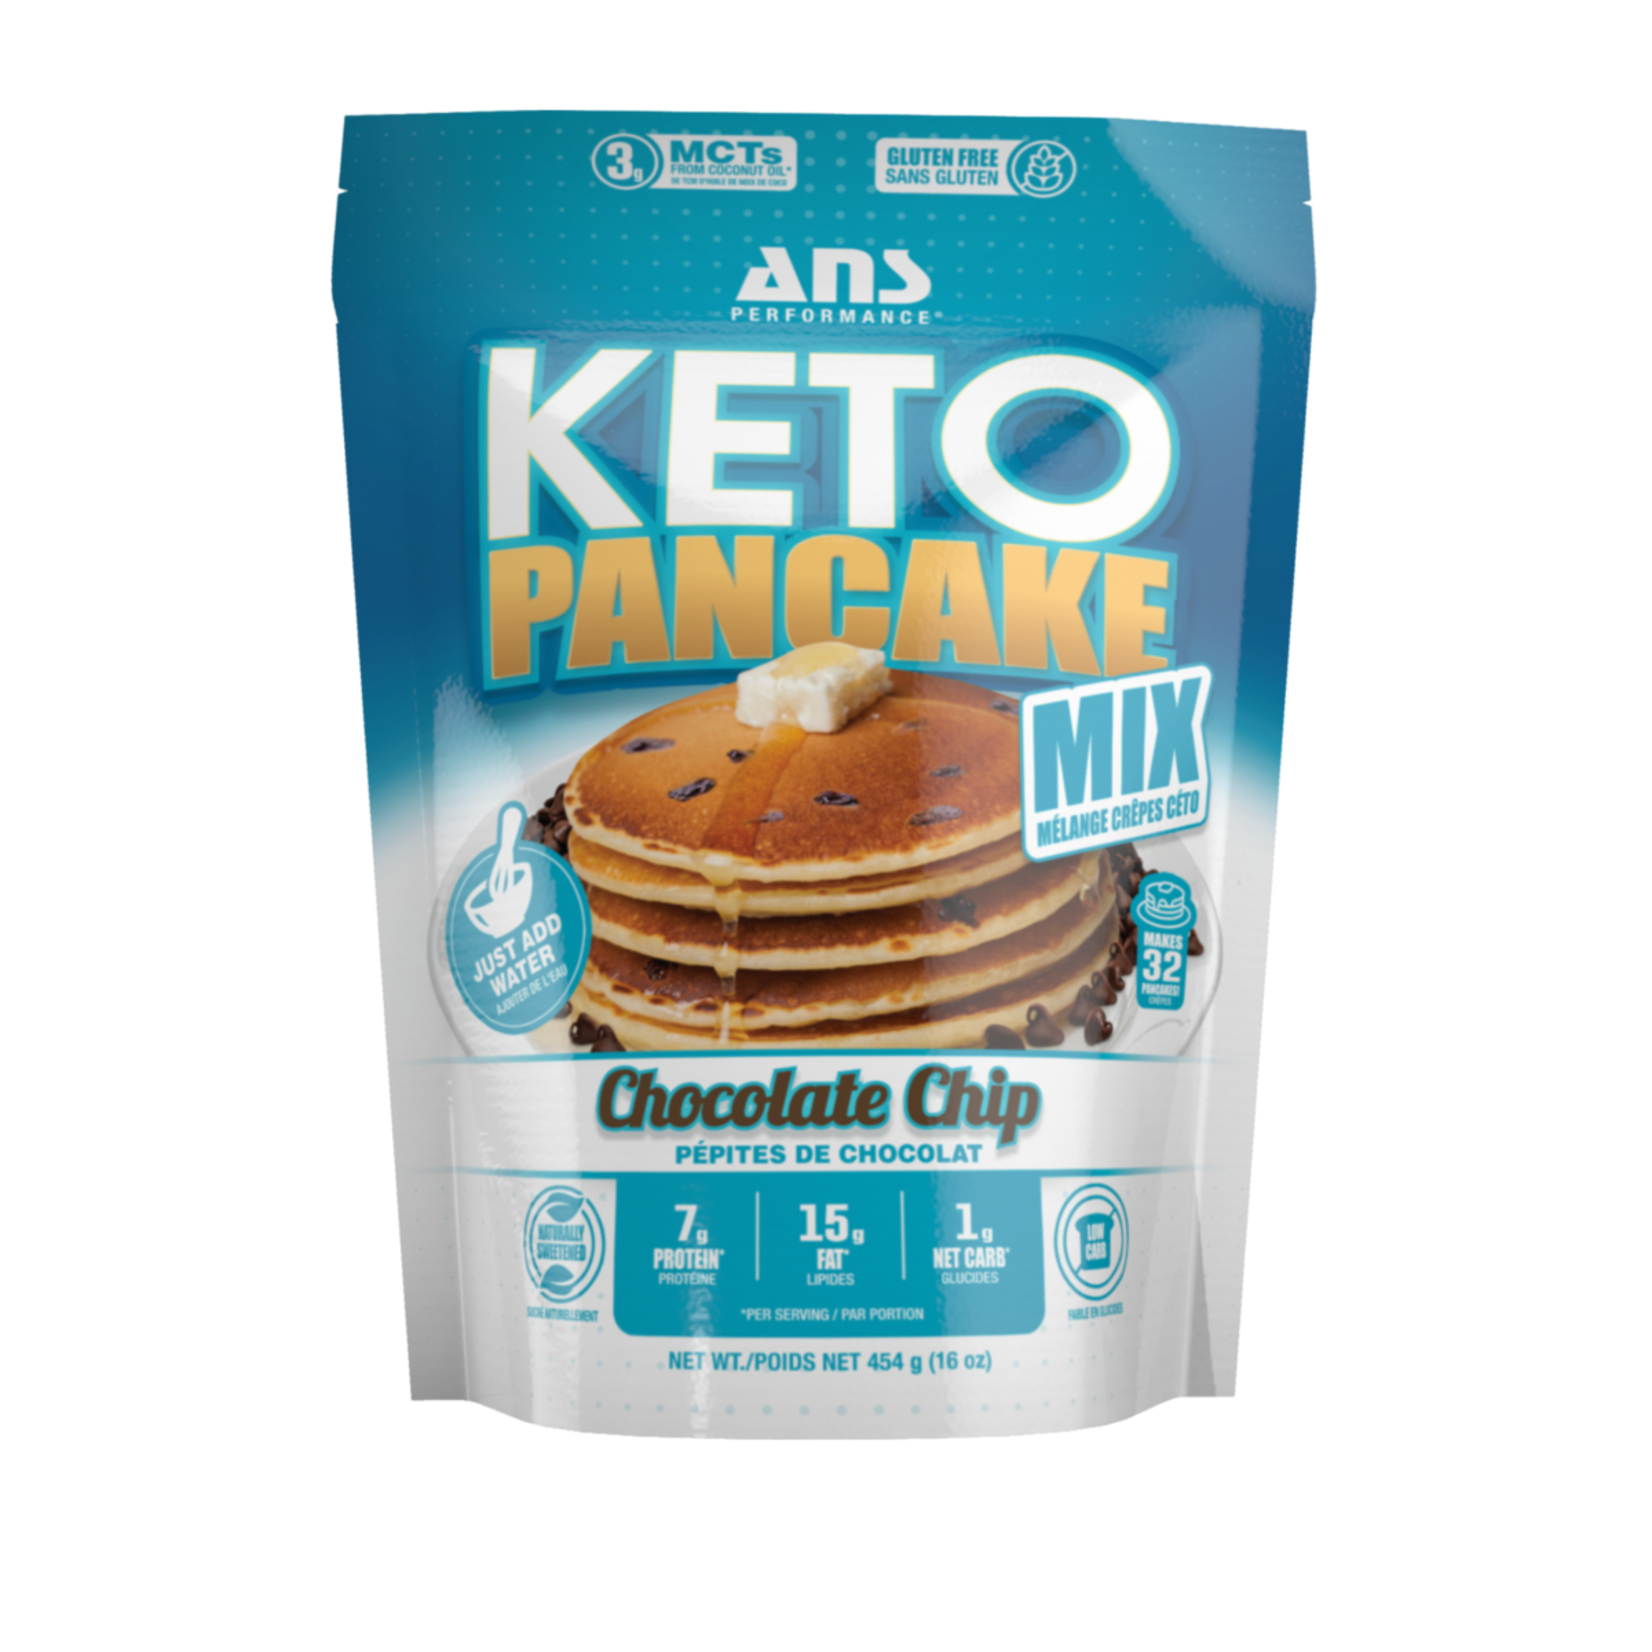 ANS ANS Keto Pancake Mix Chocolate Chip 454g